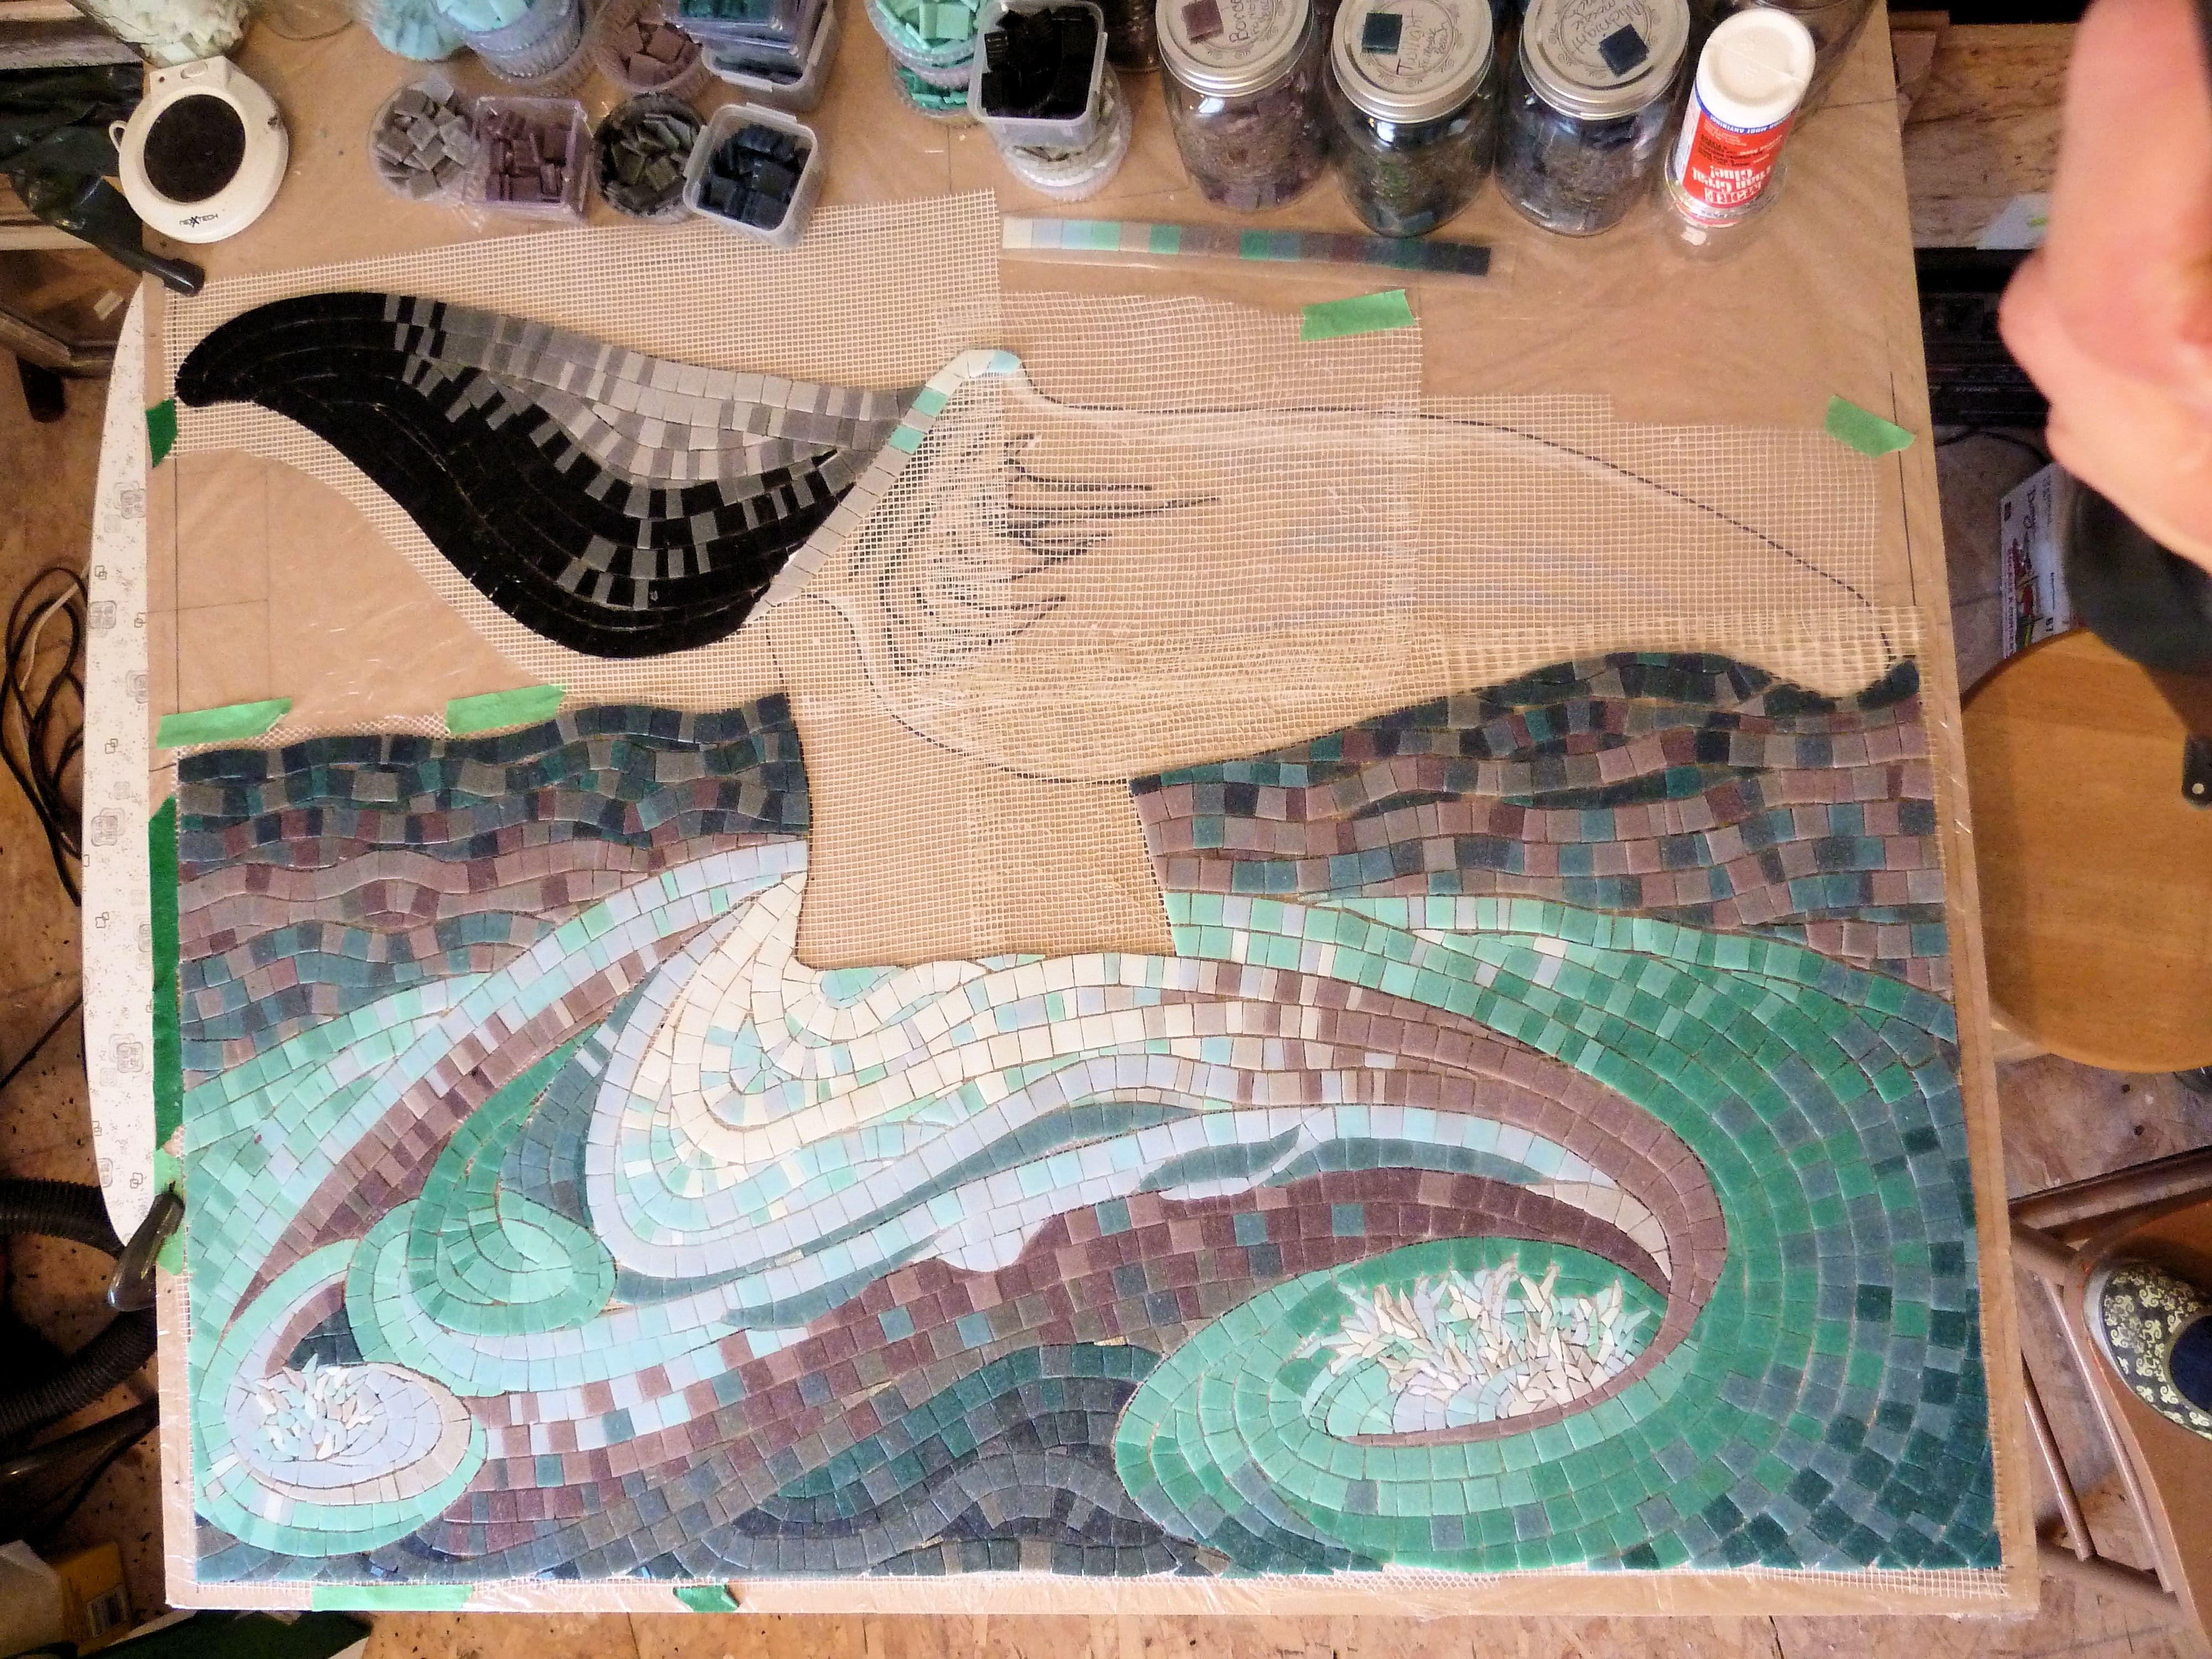 Half a fin - Legacy Cruise Project Progress  whale tail progress April 2012  a (1)-min